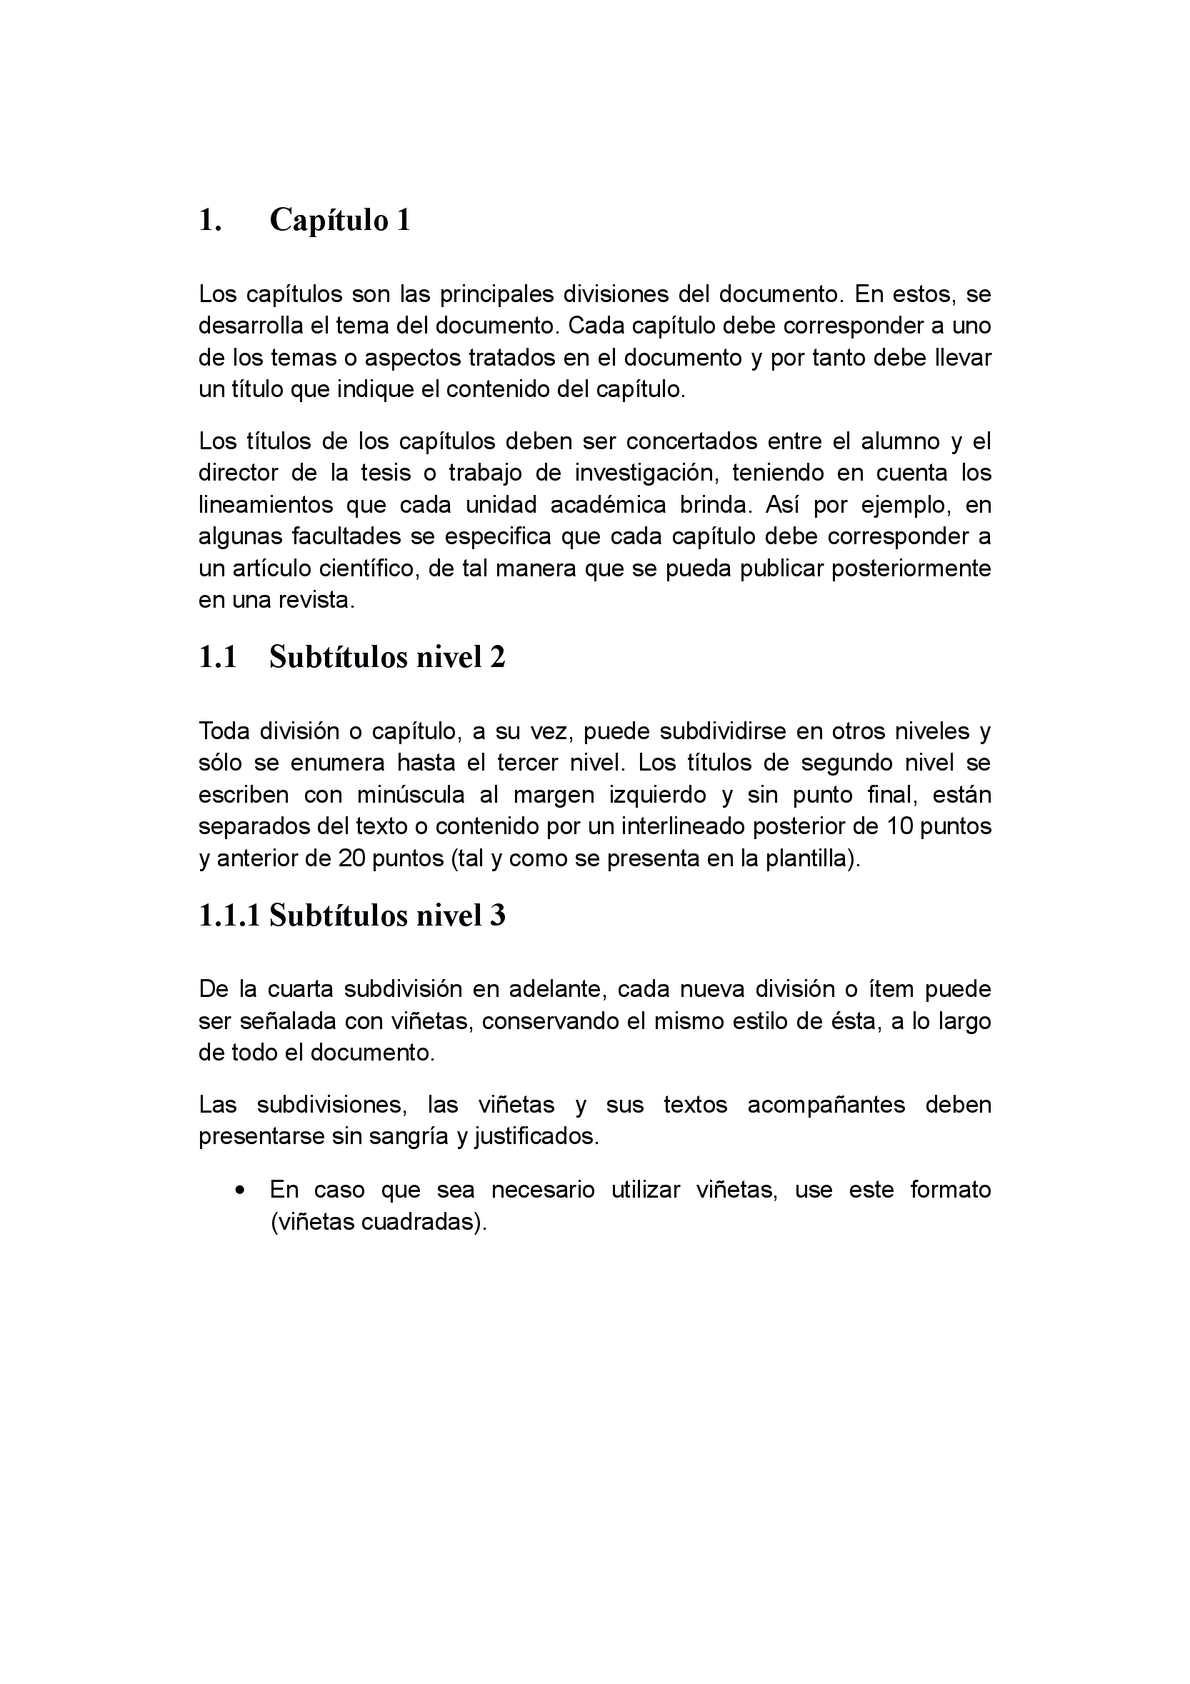 Jejercicios resueltos d word - CALAMEO Downloader